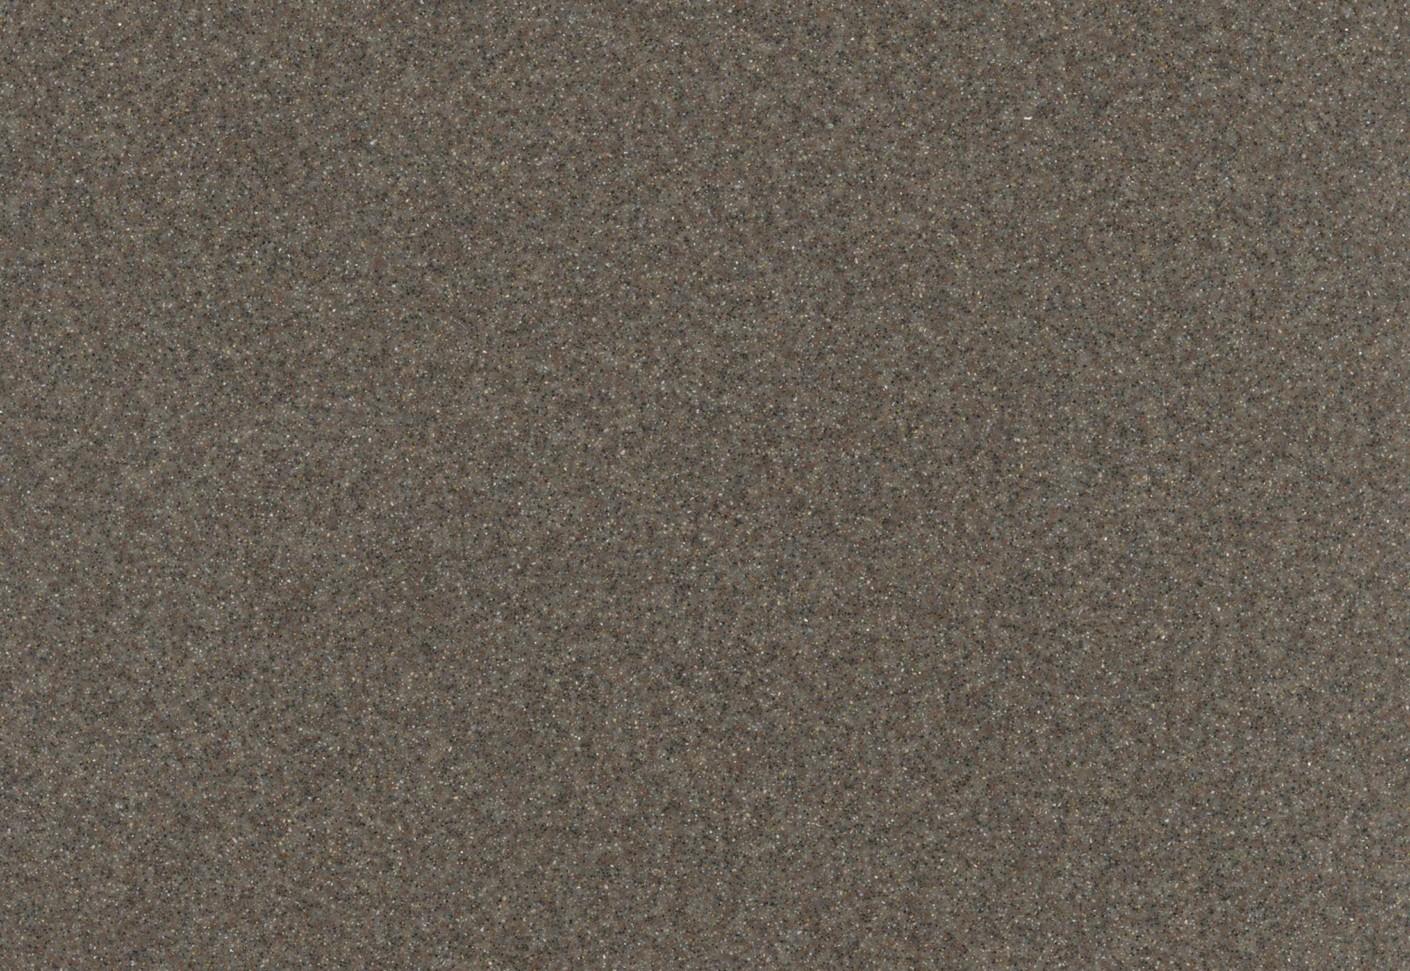 Corian Walls Silt By Dupont Corian Stylepark Buy Qz800